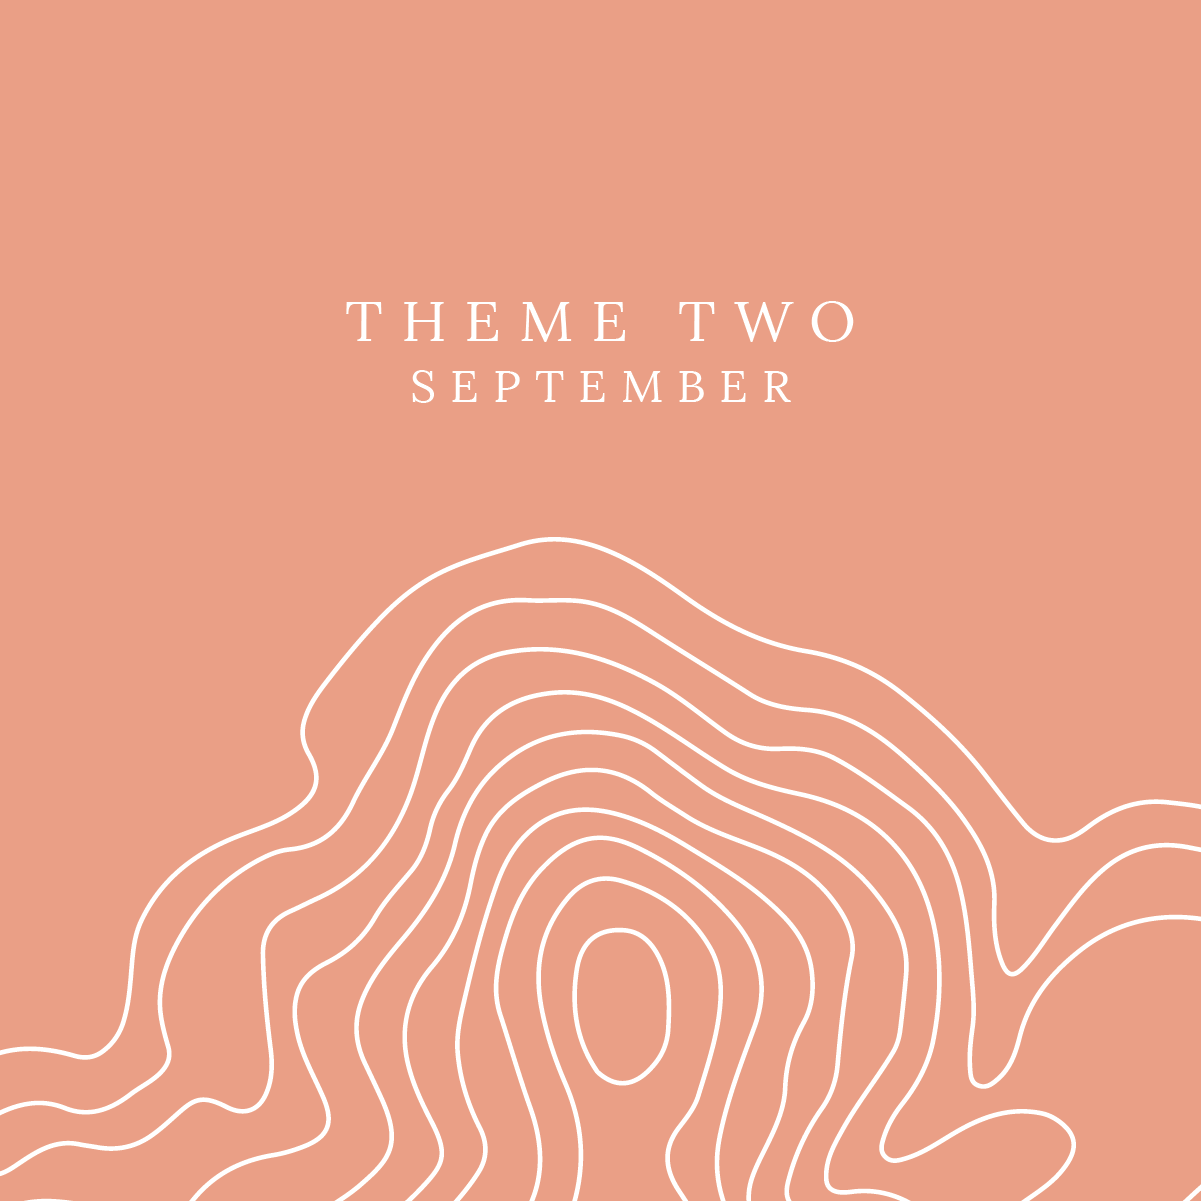 SEPTEMBER Theme Thumbnails-09.png